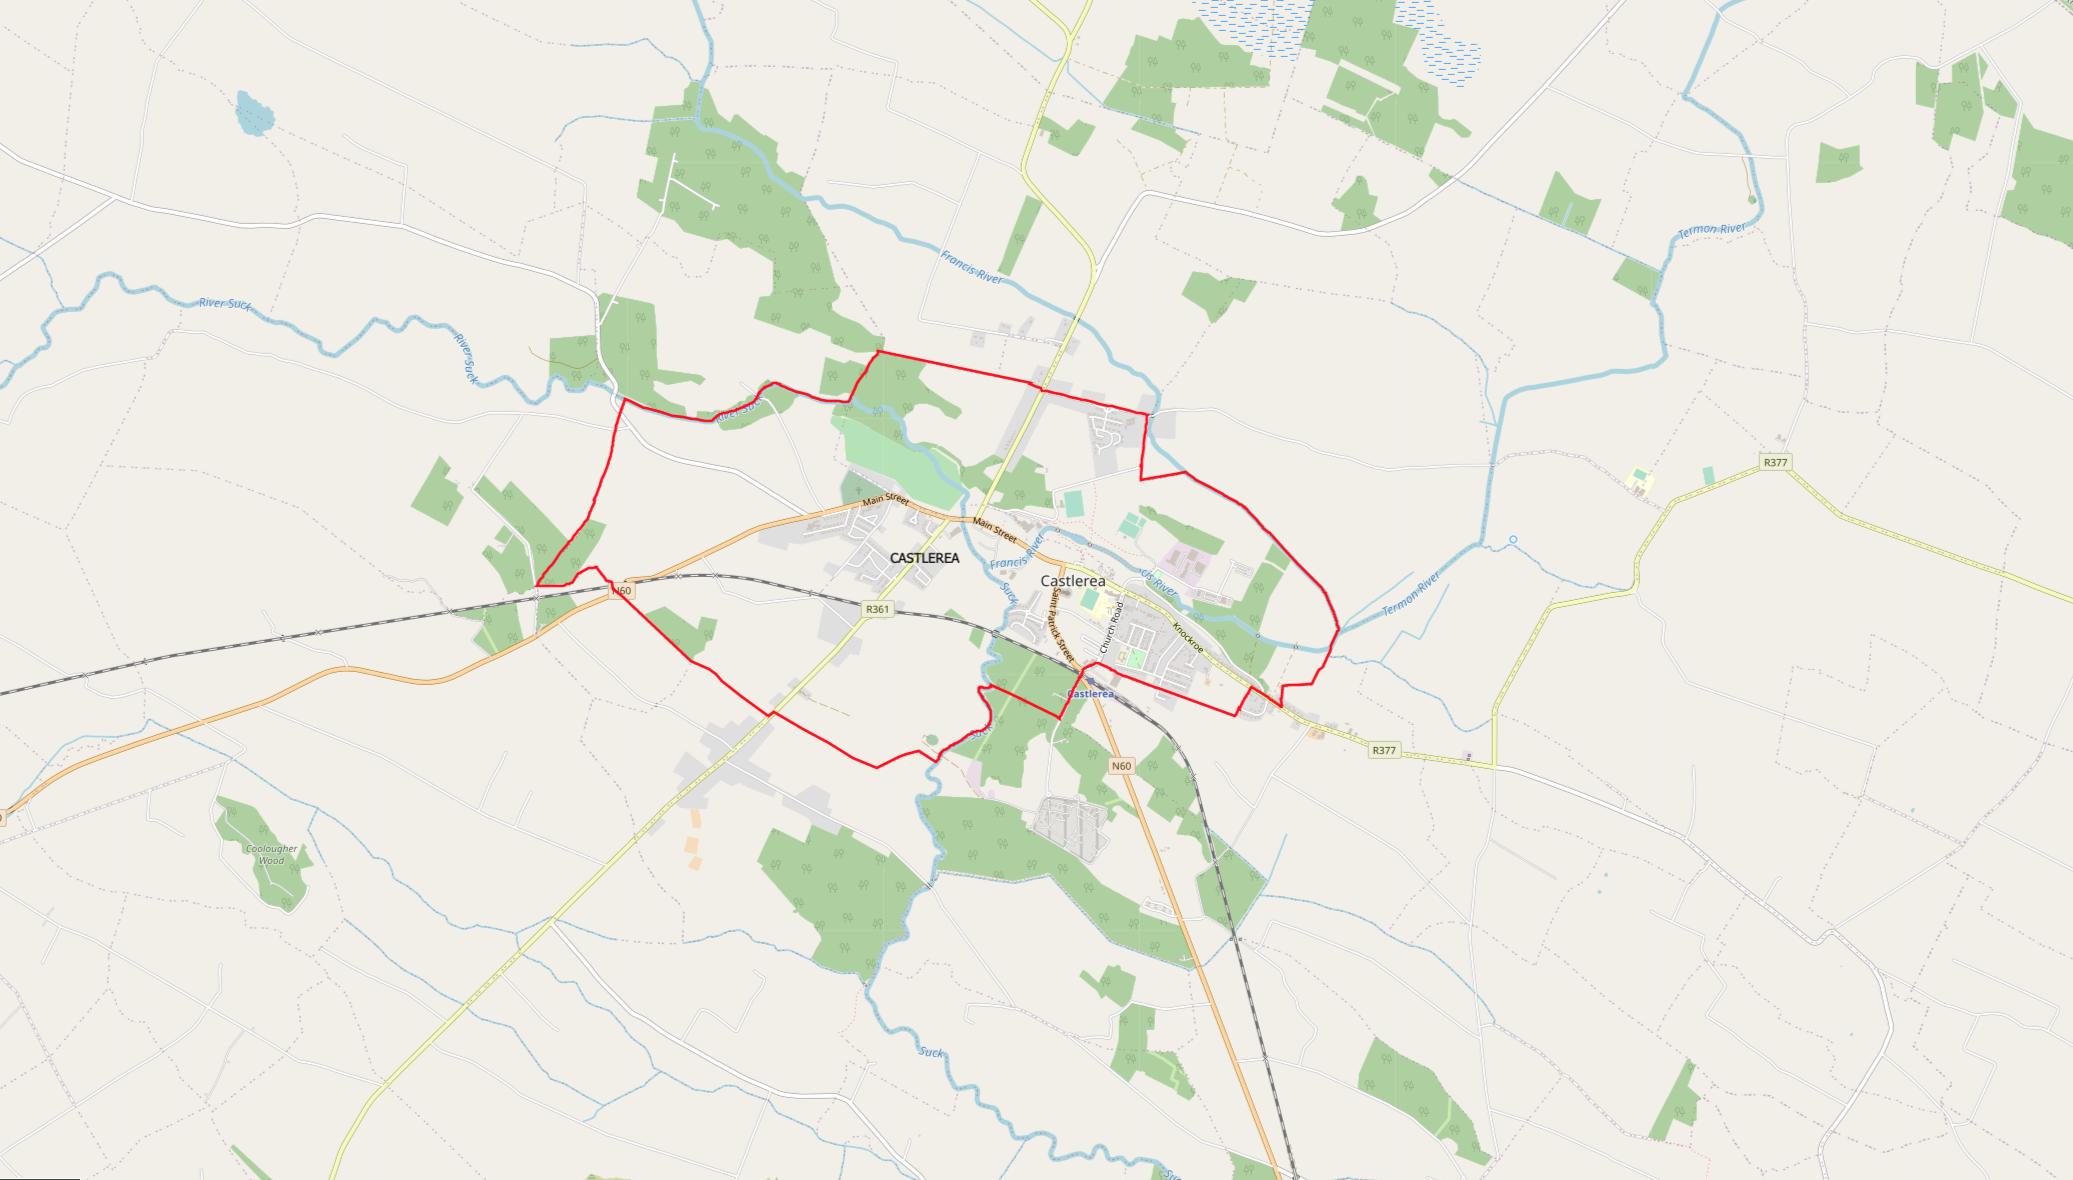 solar-panels-castlerea-roscommon-ireland-map-img